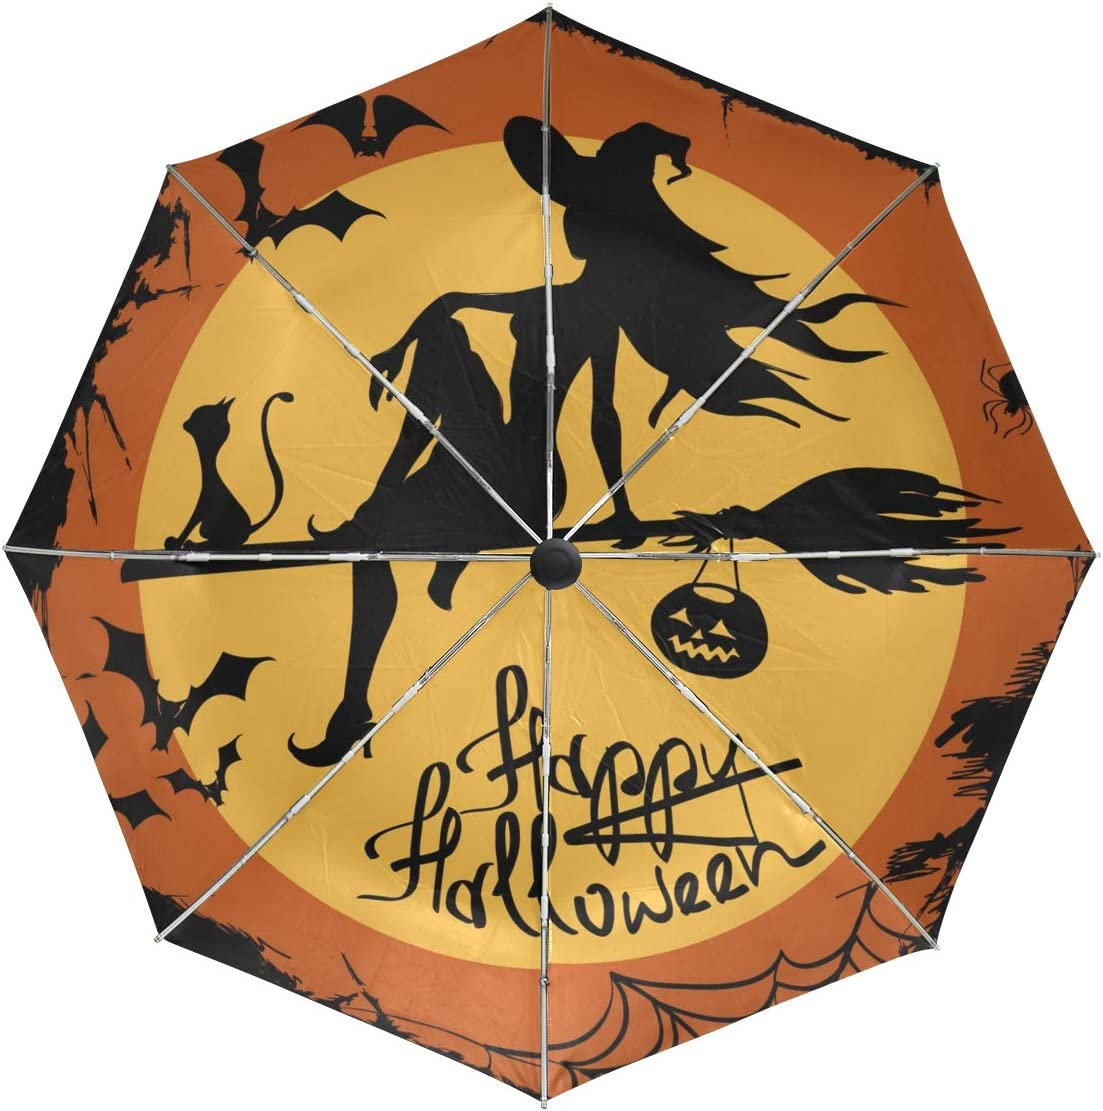 Wamika Automatic Umbrella Happy Windproo trust Witch Award-winning store Pumpkin Halloween